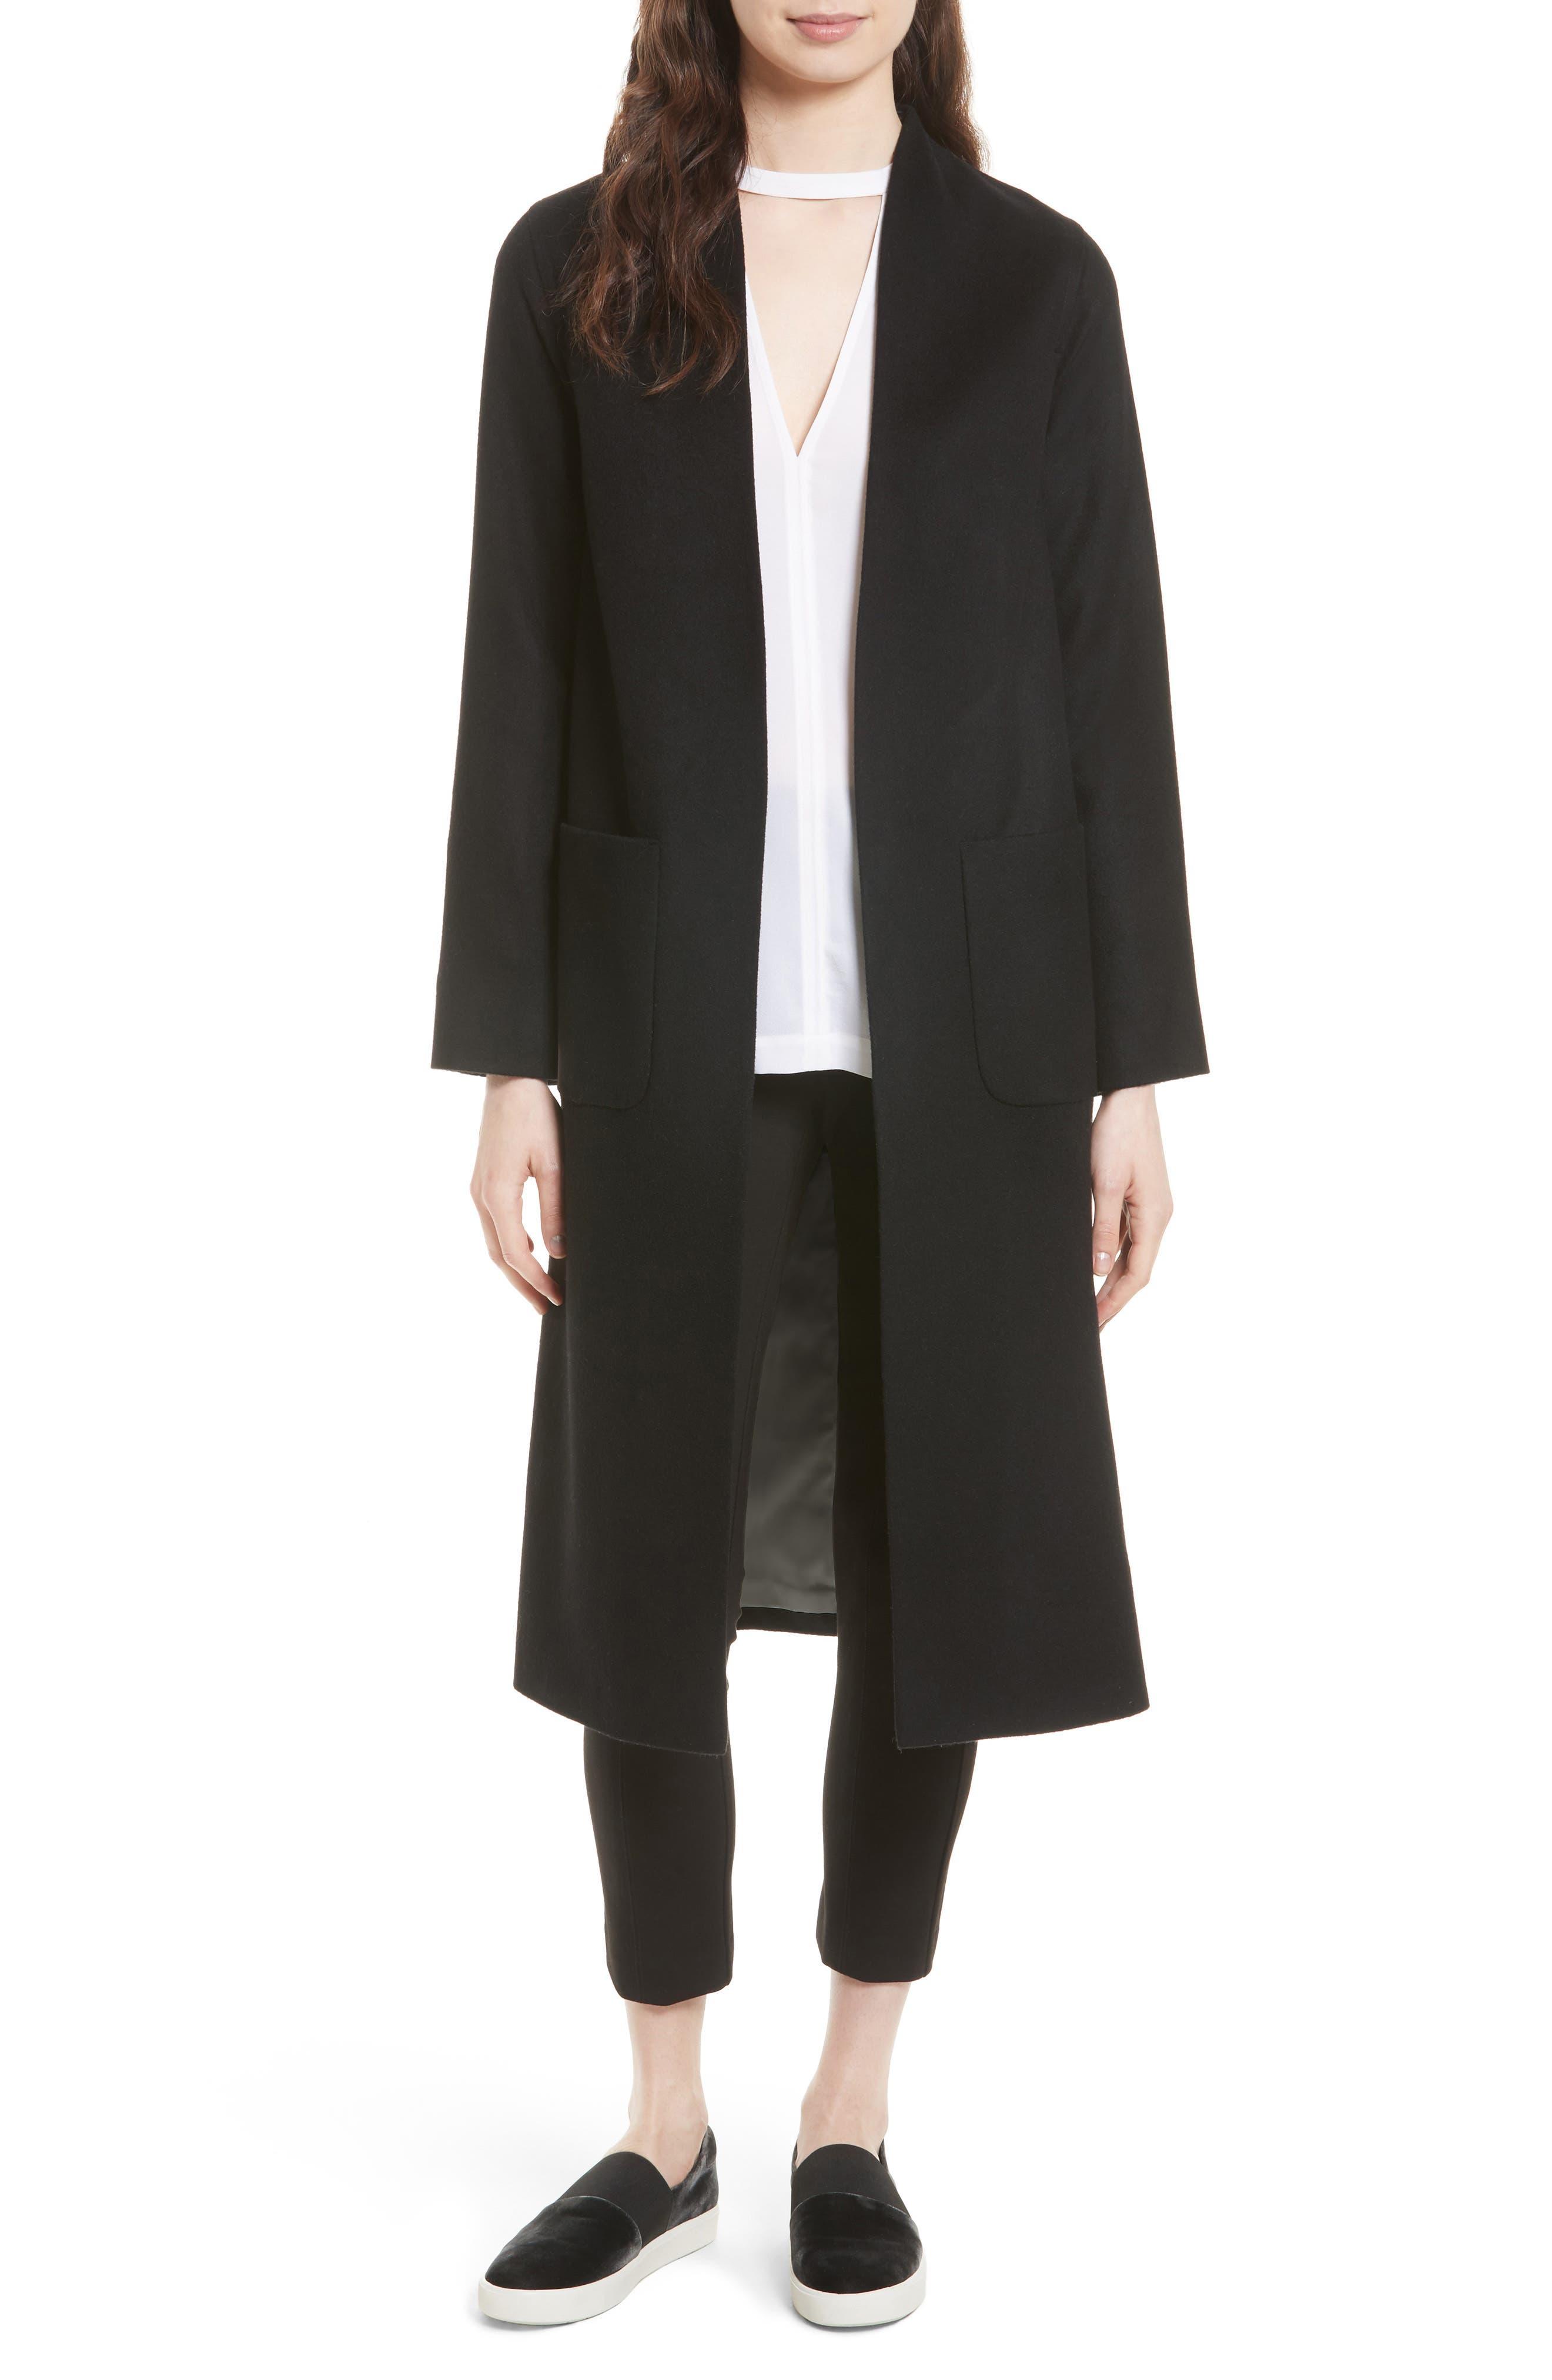 Alternate Image 1 Selected - Helene Berman Wool & Cashmere Longline Coat